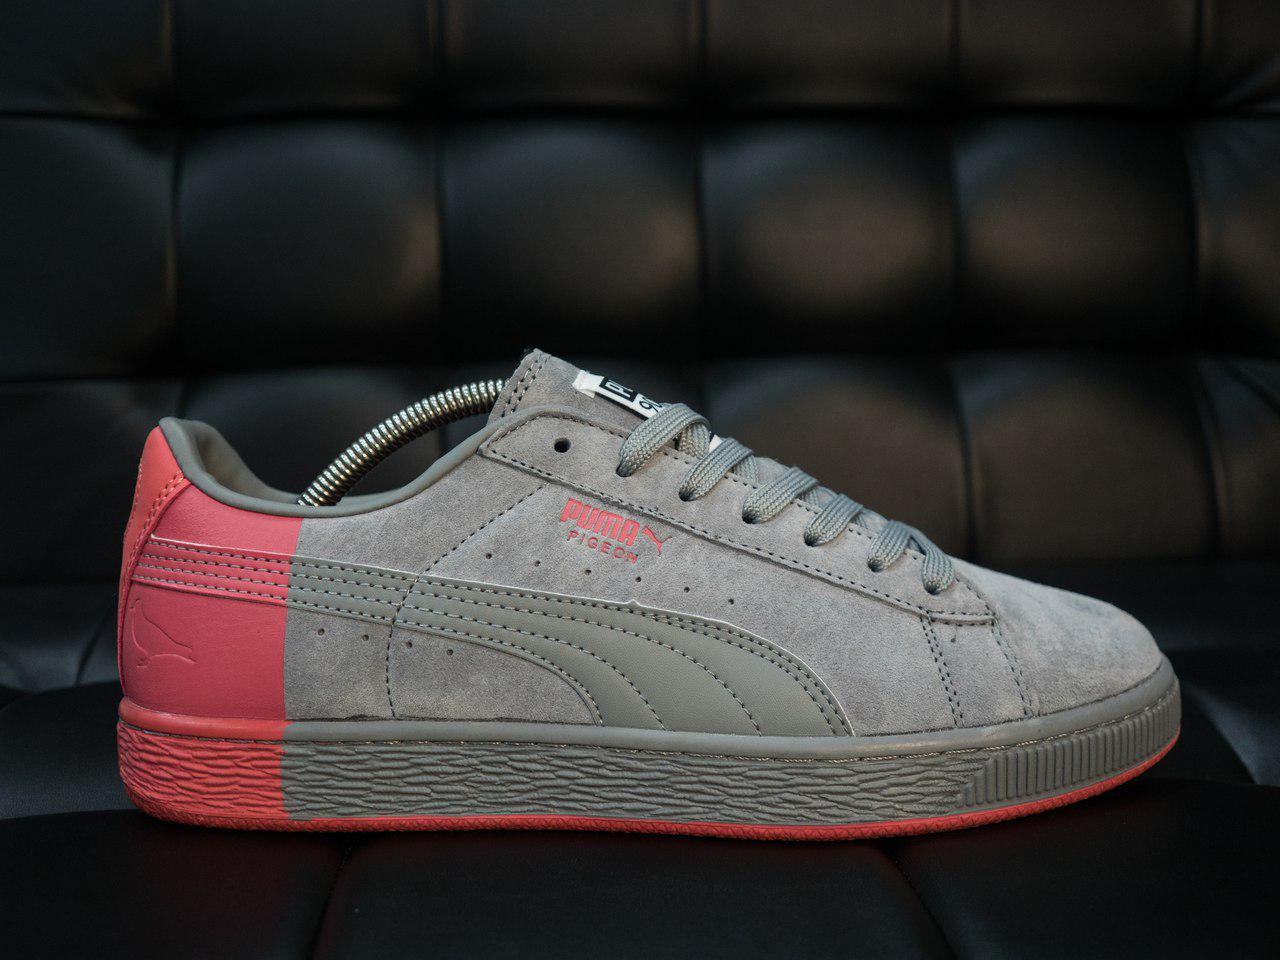 00297e9ff845 Мужские кроссовки Puma Suede кроссовки пума серые - Замша,подошва резина  ,размеры 40